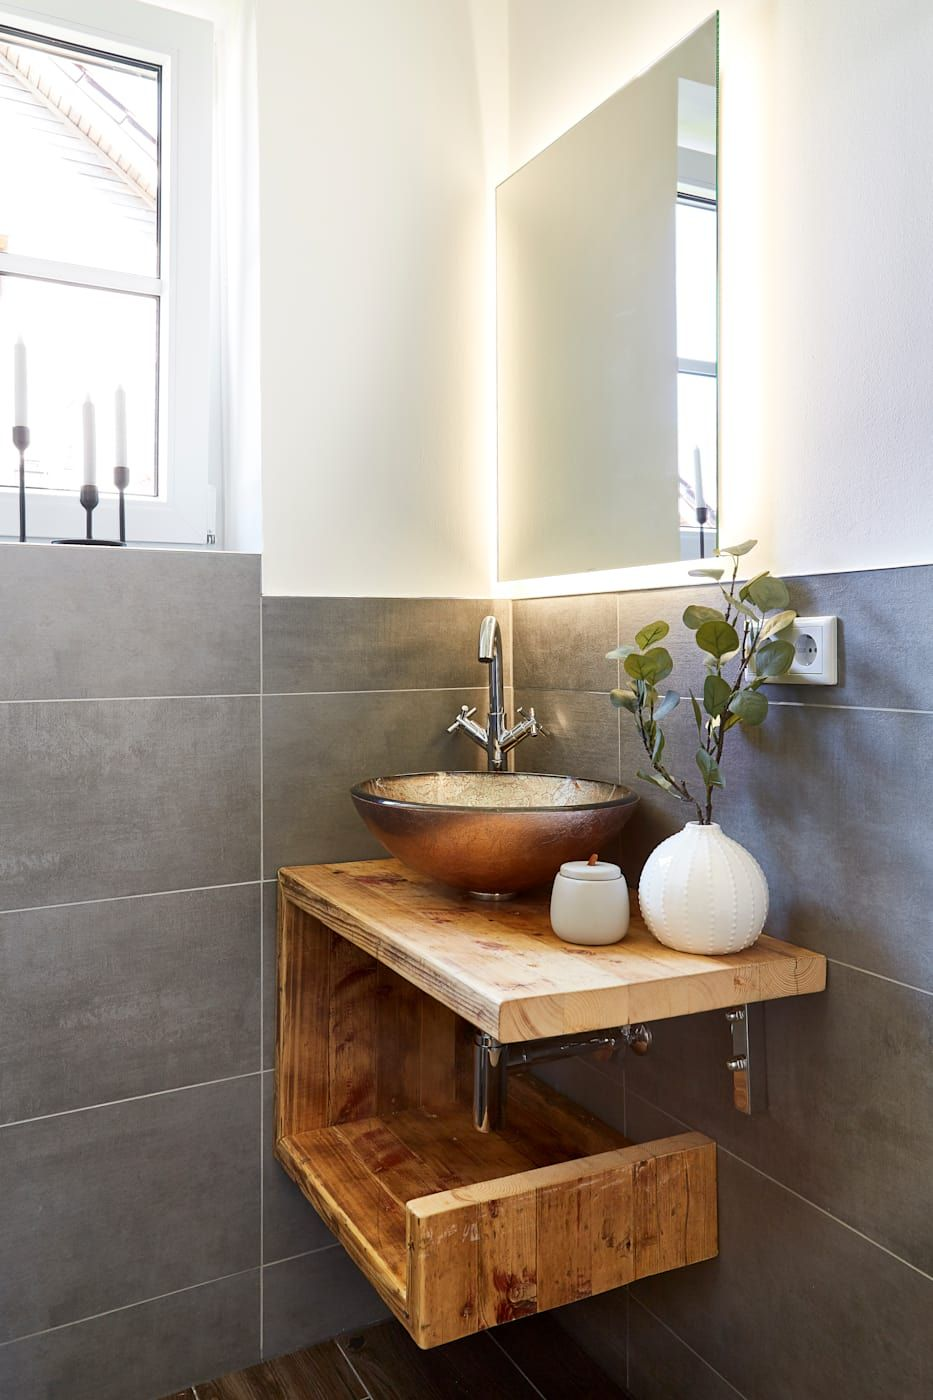 Gastebad Im Landhausstil Moderne Badezimmer Von Banovo Gmbh Modern Holz Holznachbildung Homify Badezimmer Landliche Badezimmer Gastebad